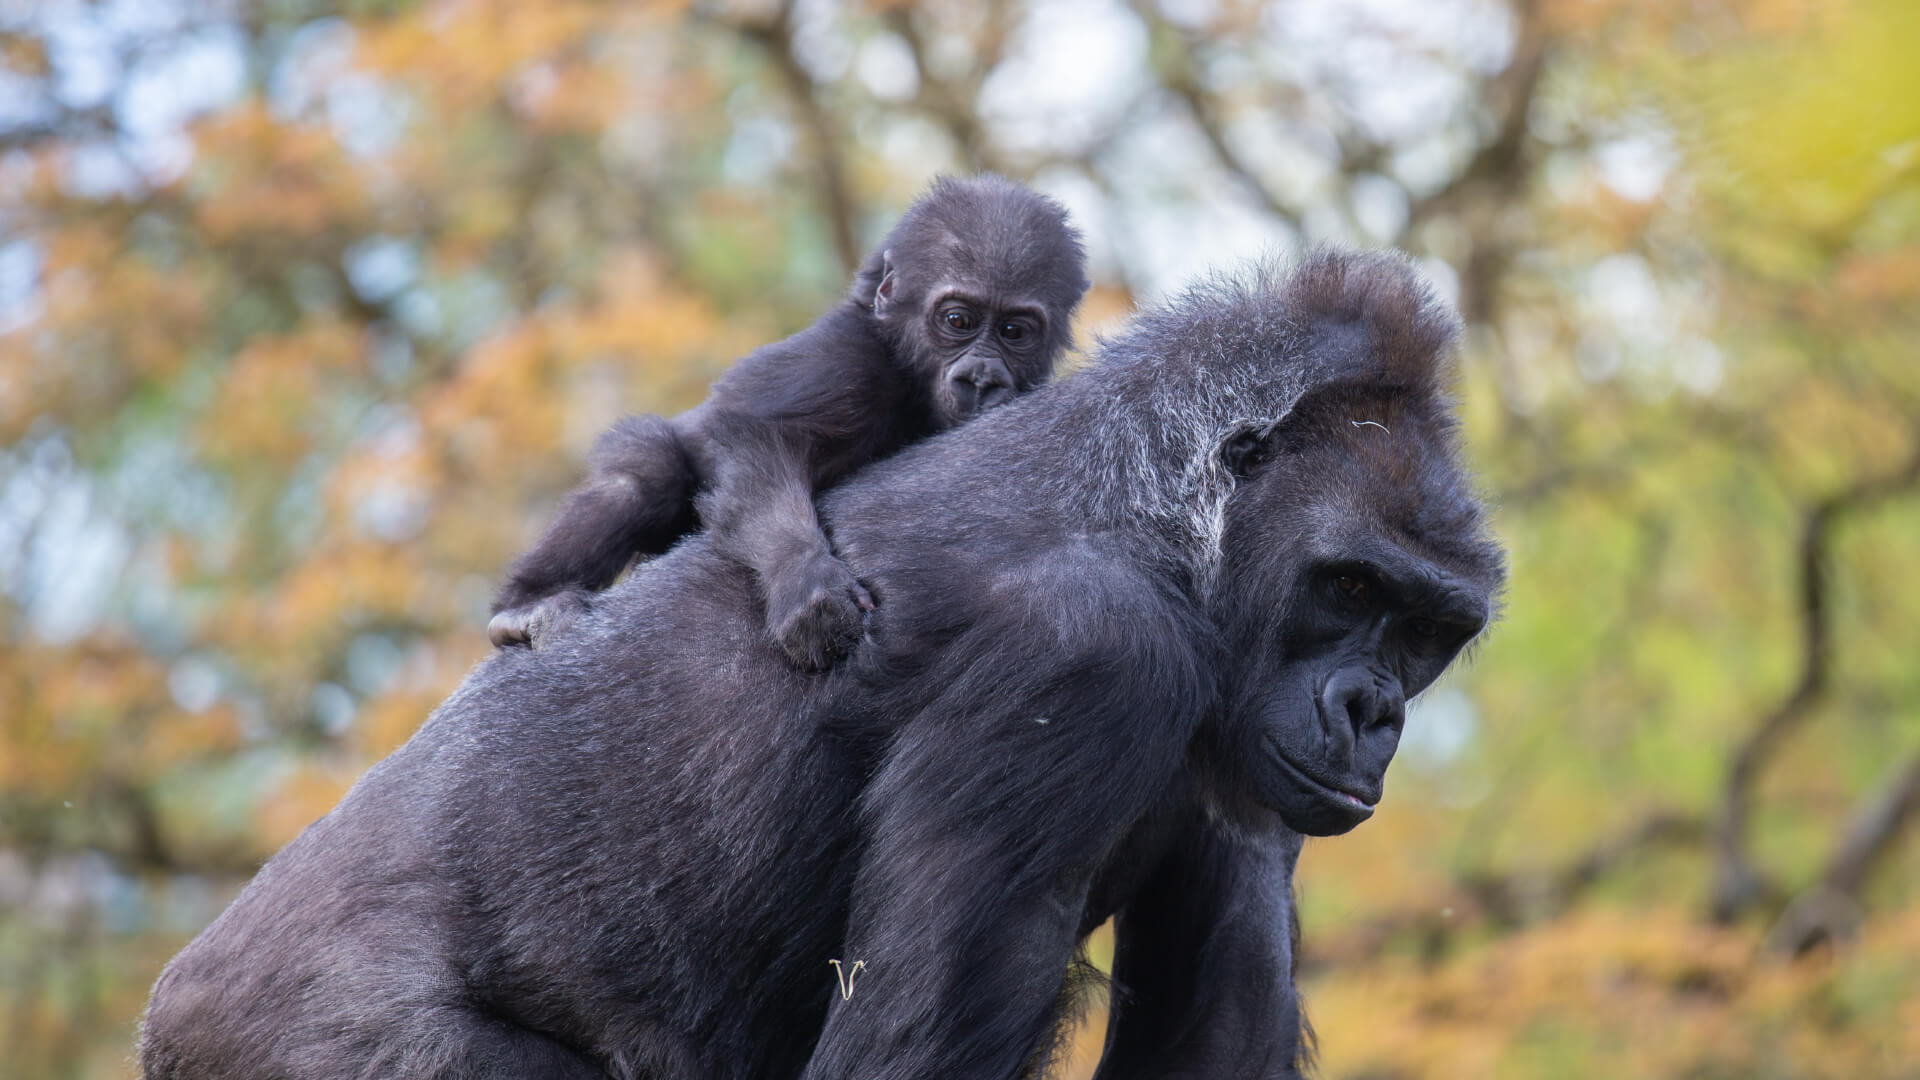 Kera and Hasani western lowland gorillas at Bristol Zoo Gardens